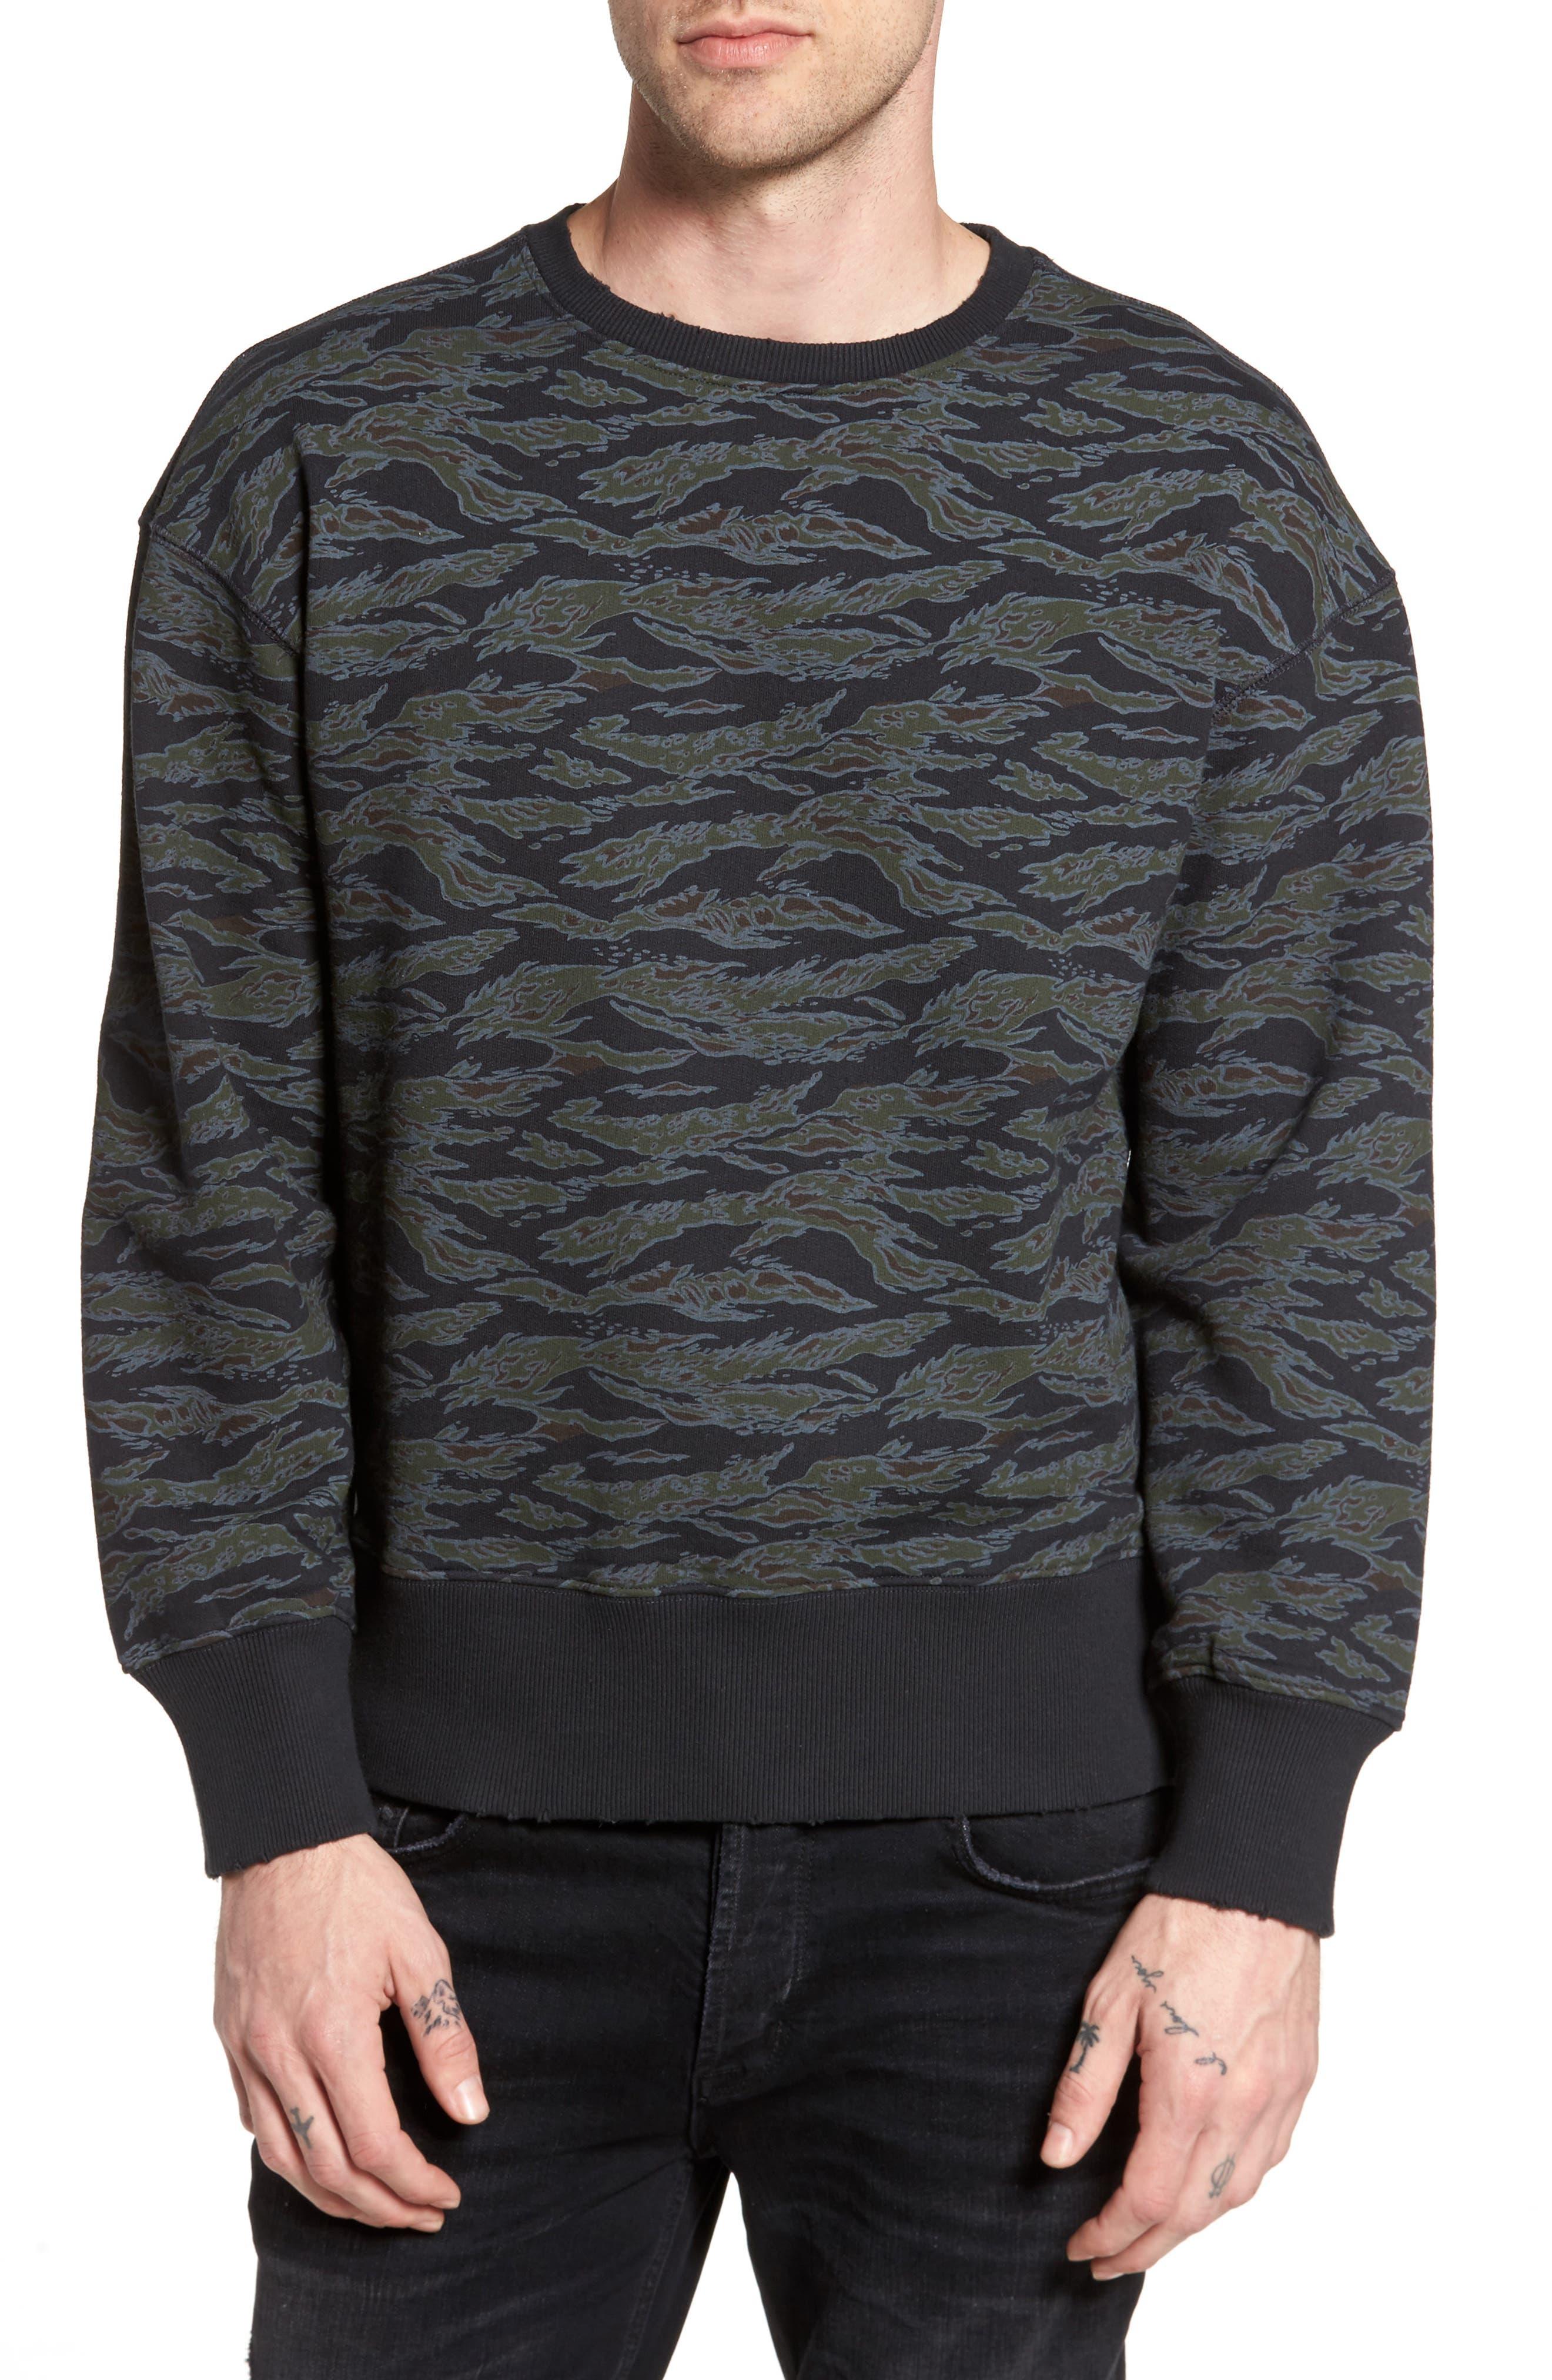 Main Image - The Rail Print Sweatshirt